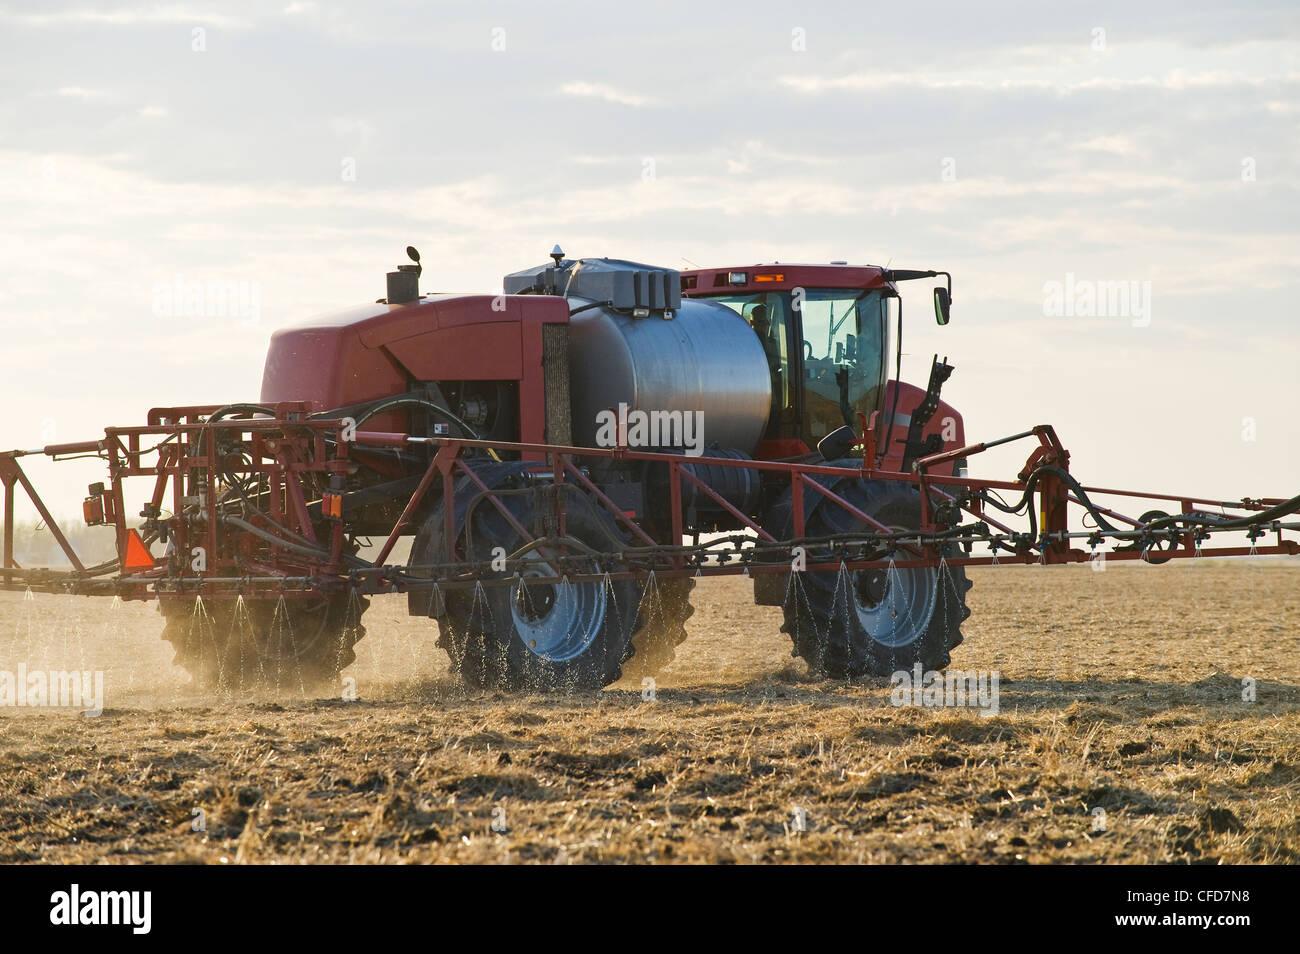 A high clearance sprayer applies liquid fertilizer on a newly seeded field, near Dugald, Manitoba, Canada - Stock Image